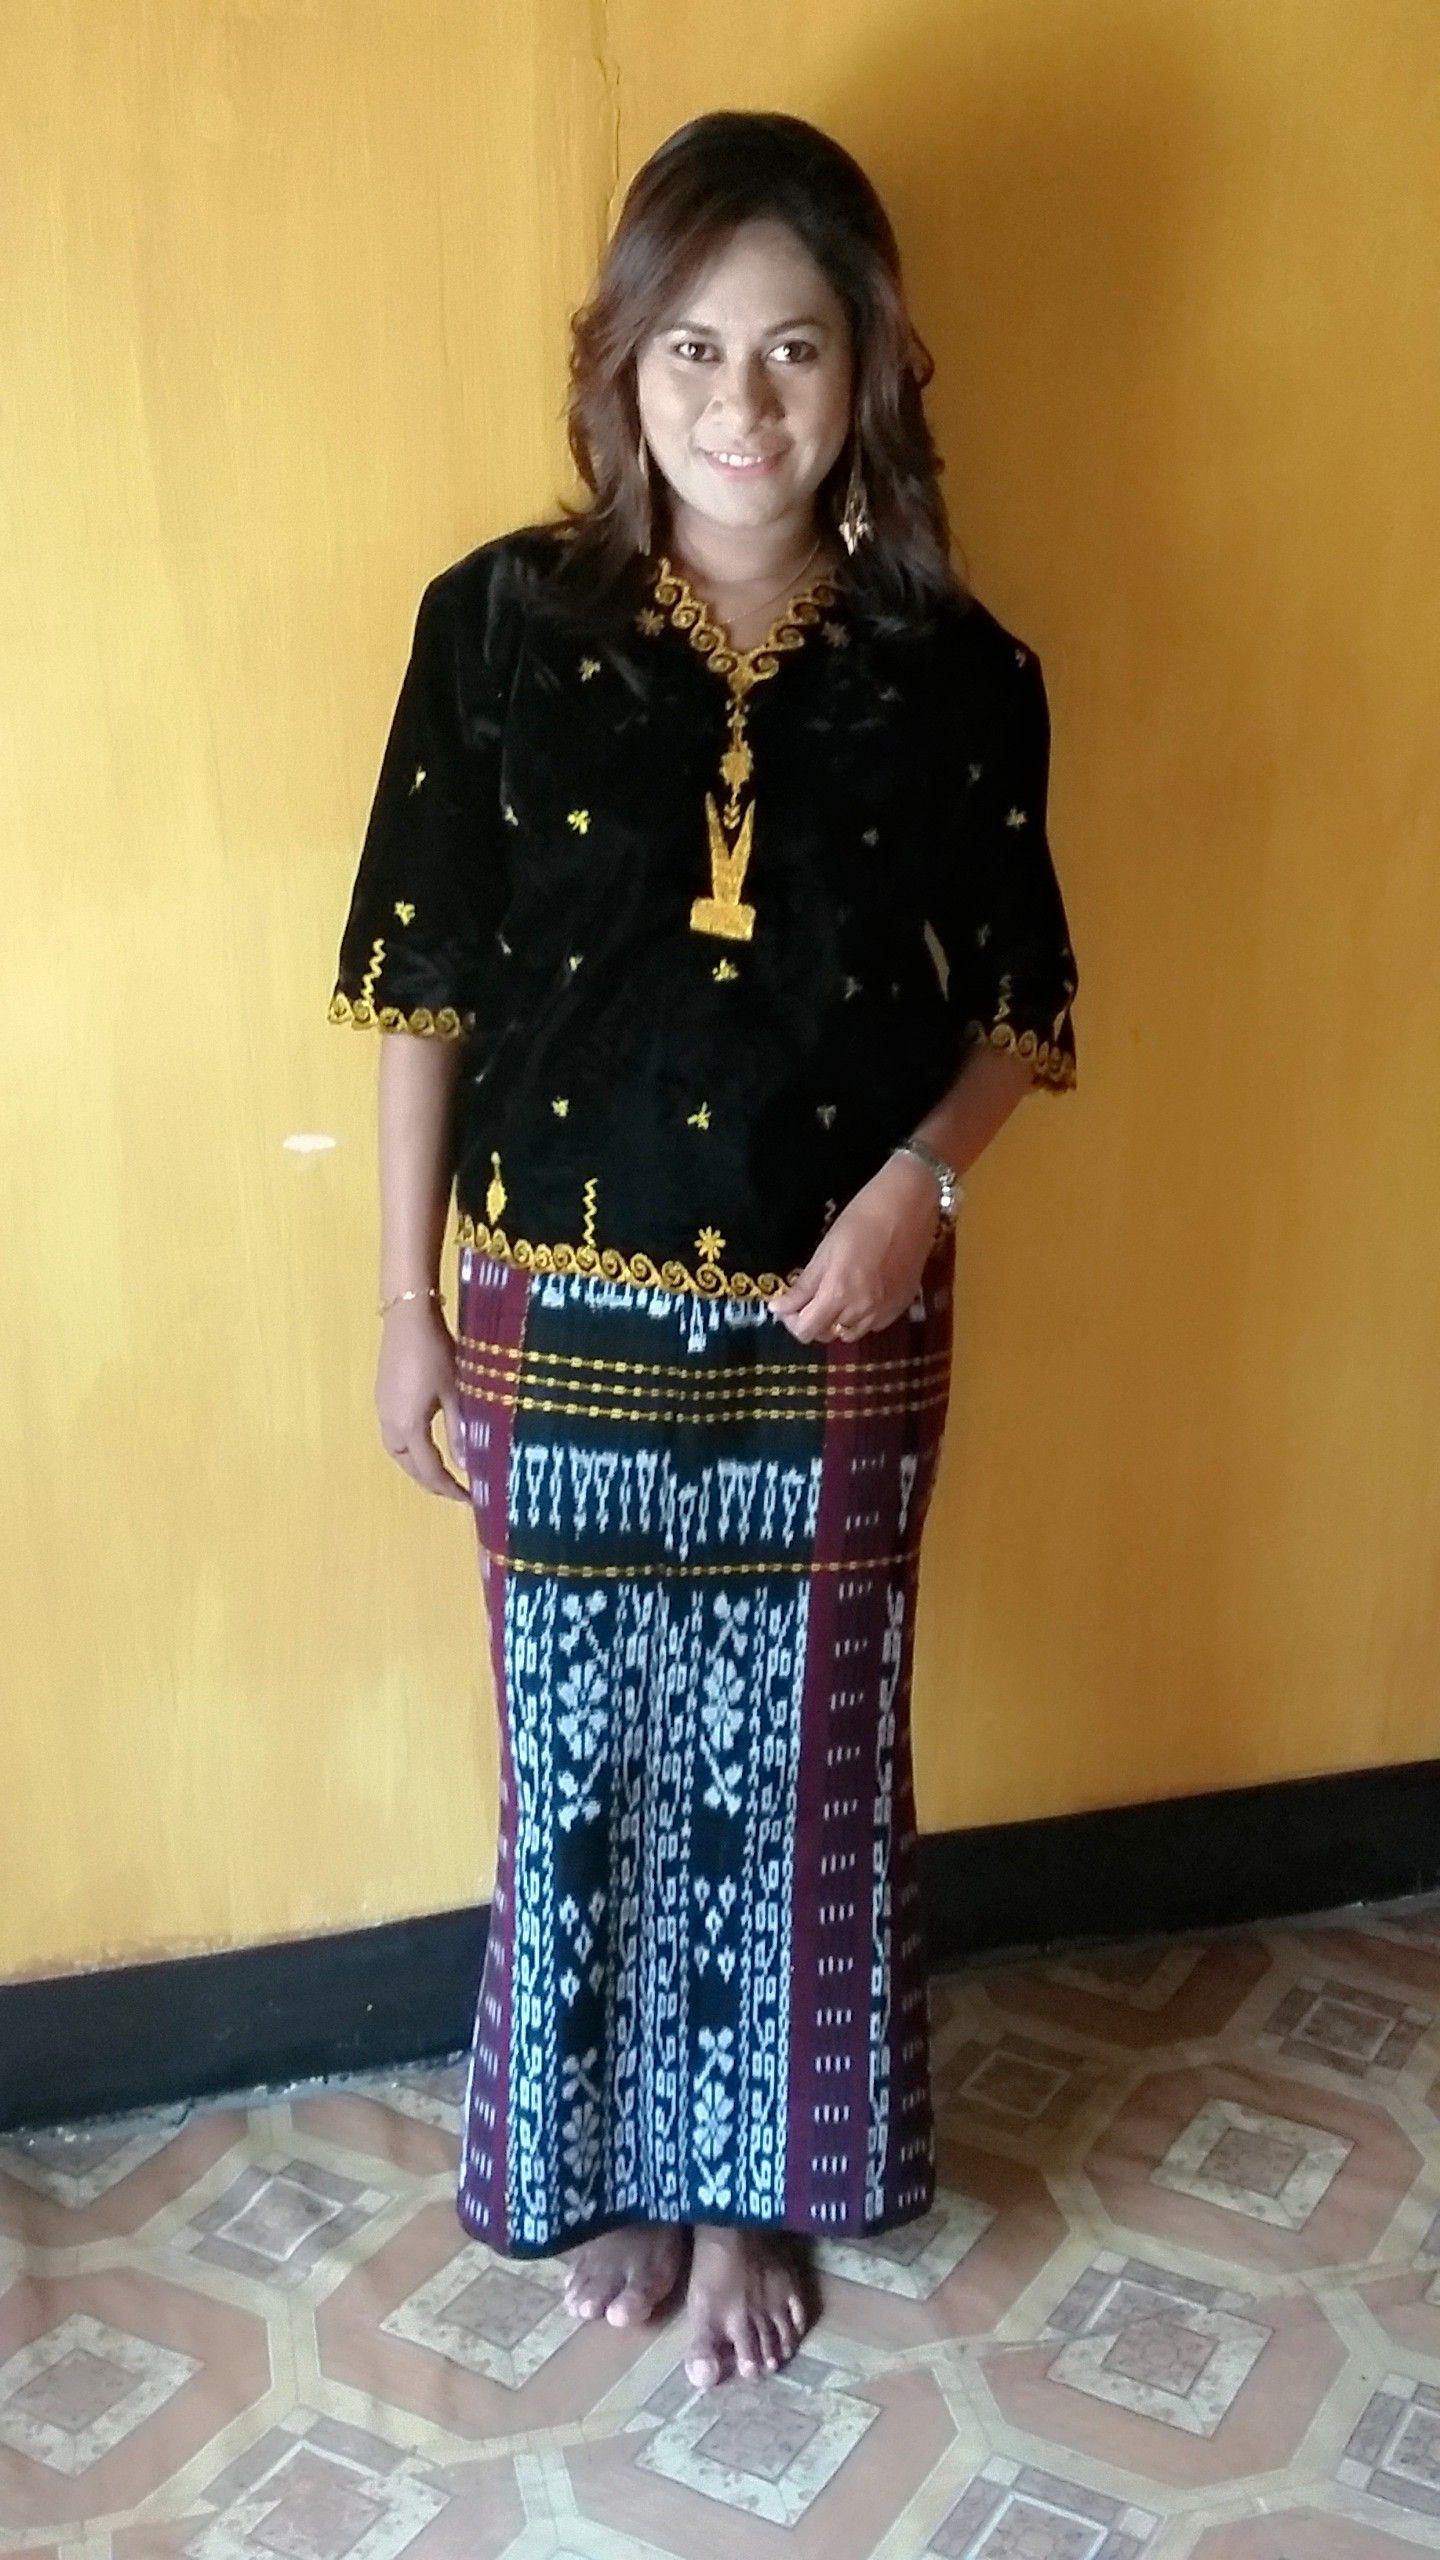 Pakaian adat Nagekeo NTT Terdiri dari anting wea baju Kodo dan rok